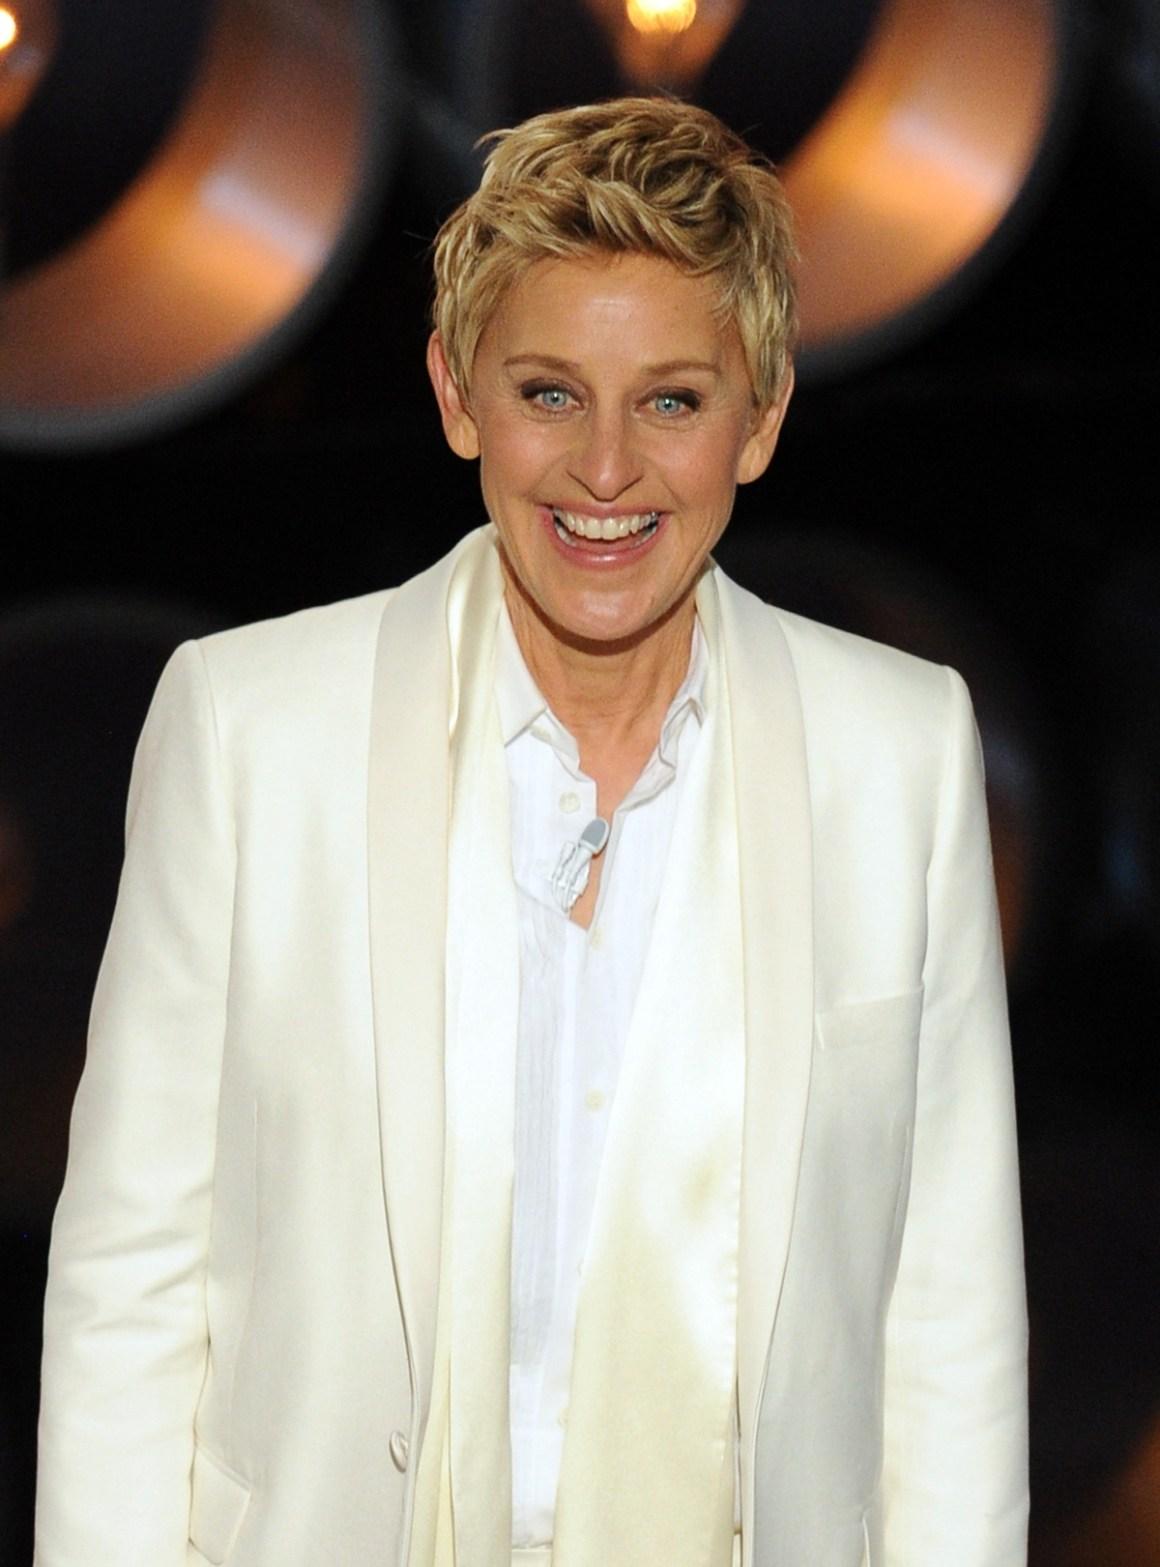 Ellen DeGeneres' talk show has lost 1 million viewers since 'toxic workplace' allegations 1